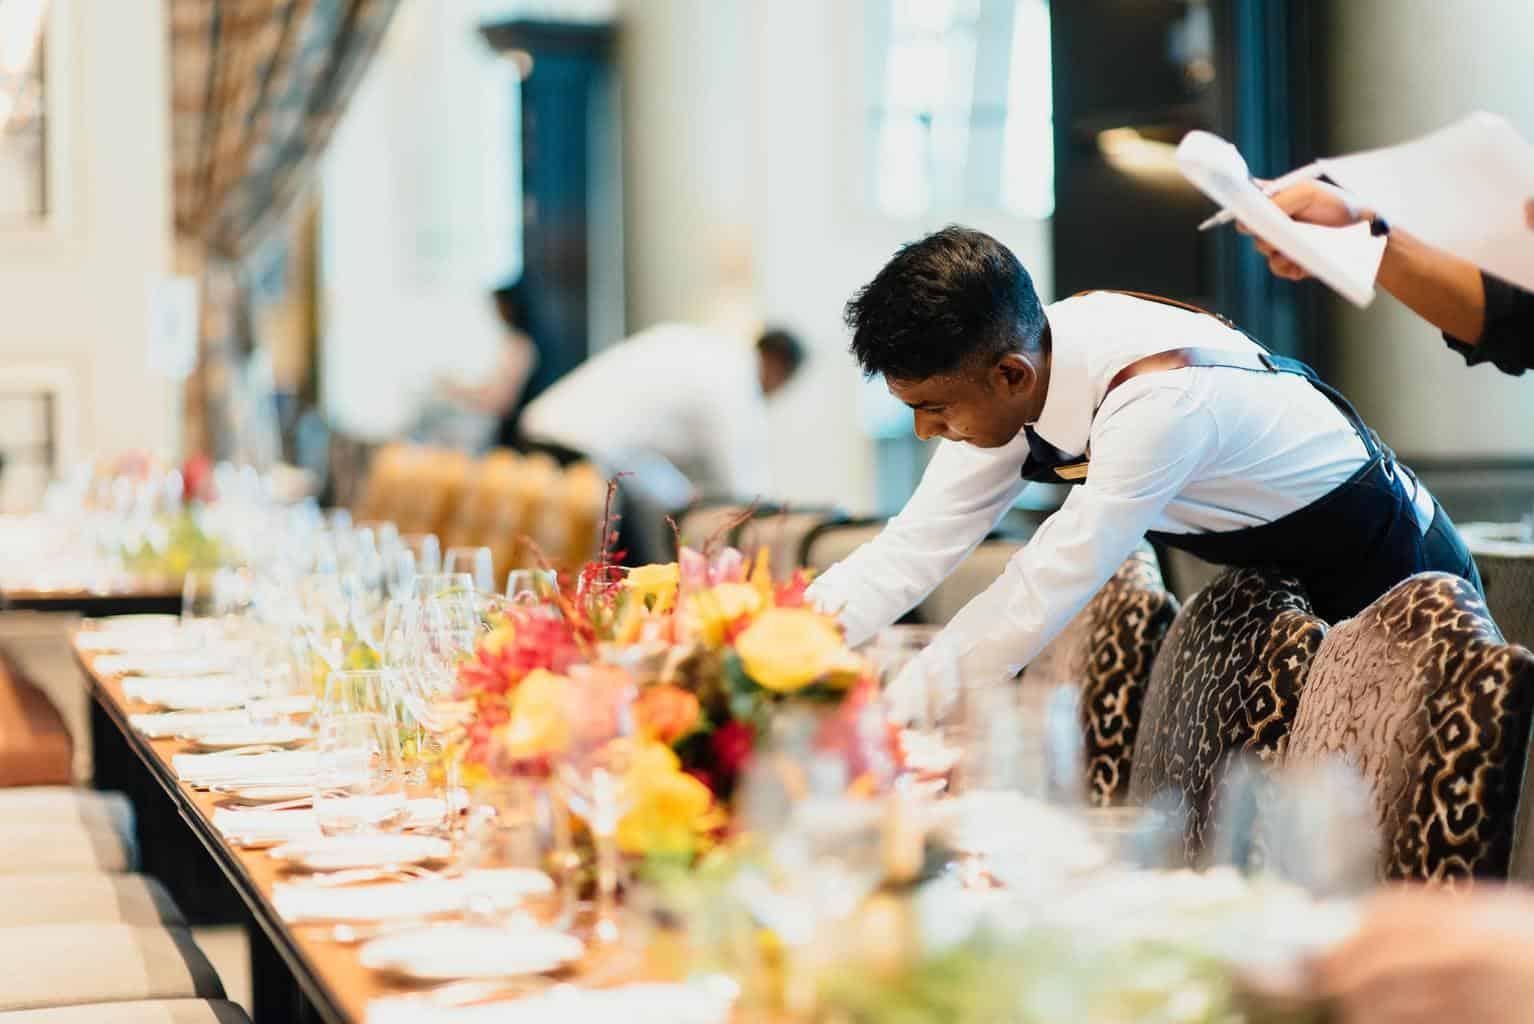 Ways the Hospitality Industry Can Take Advantage of LinkedIn